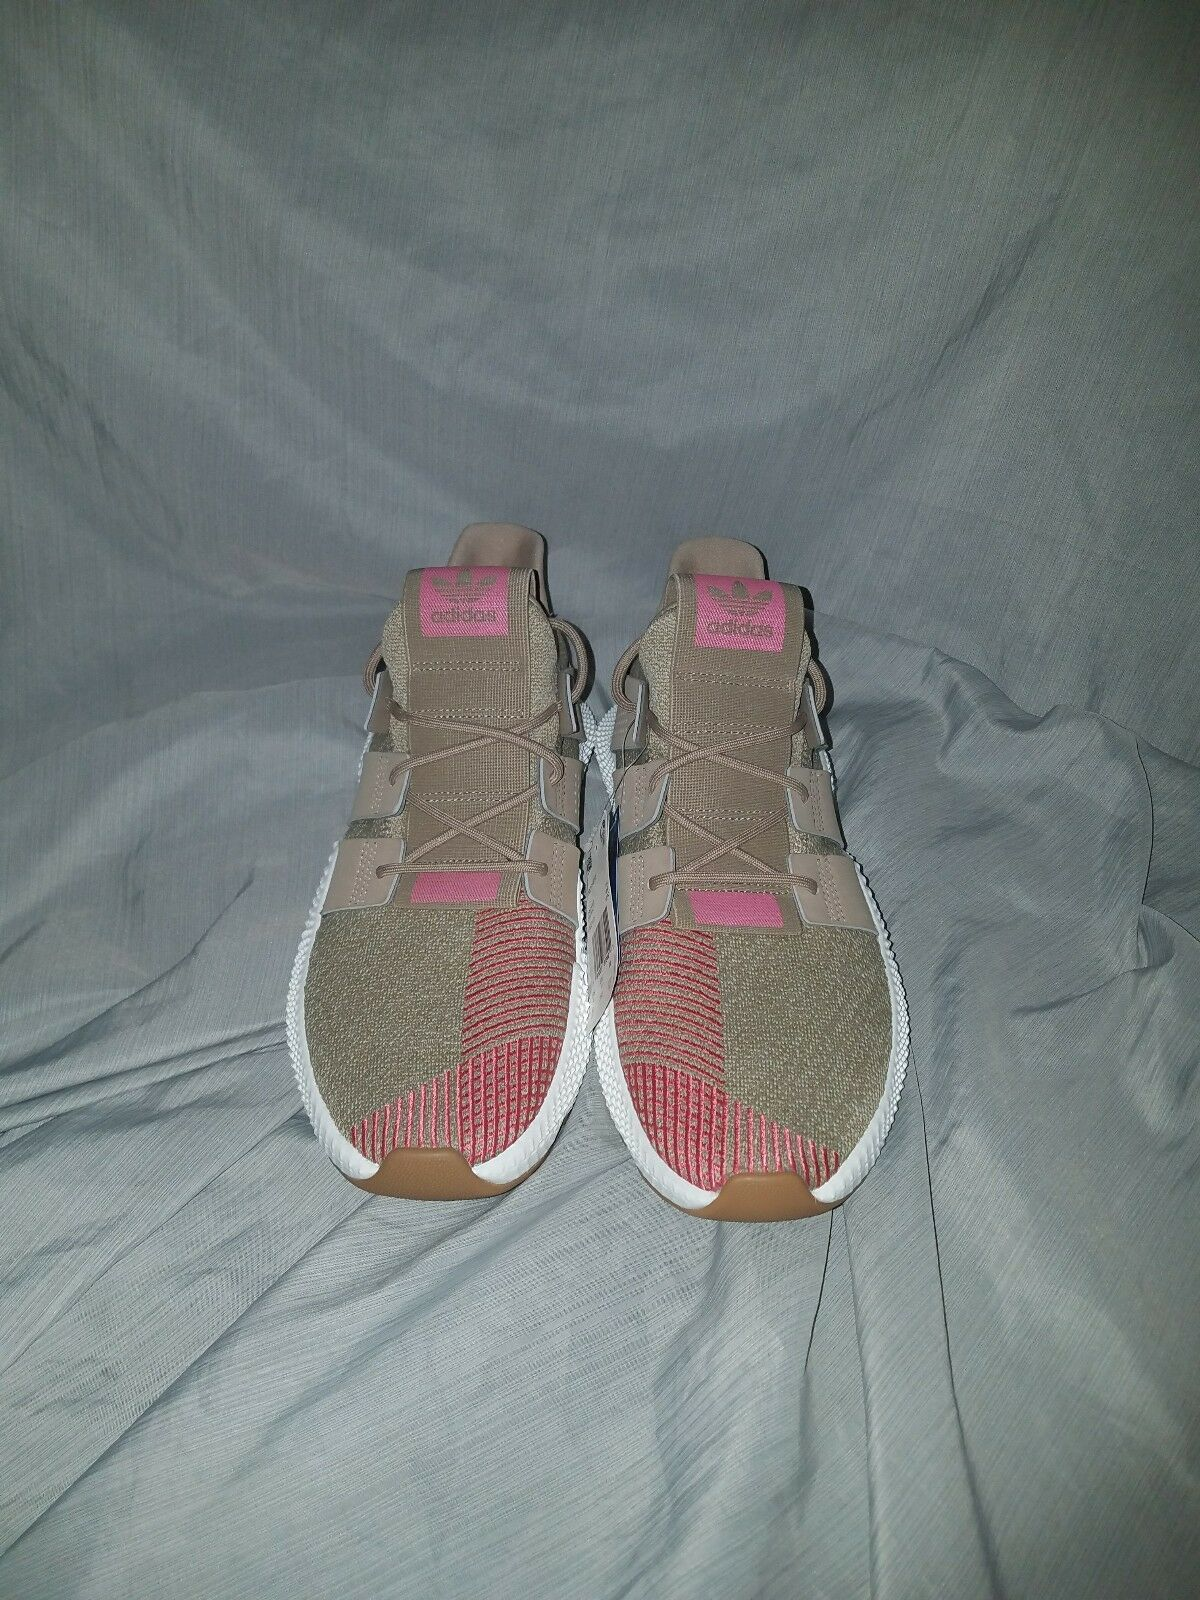 Mens Adidas Prophere Trace Khaki Whte Chalk Pink size 10